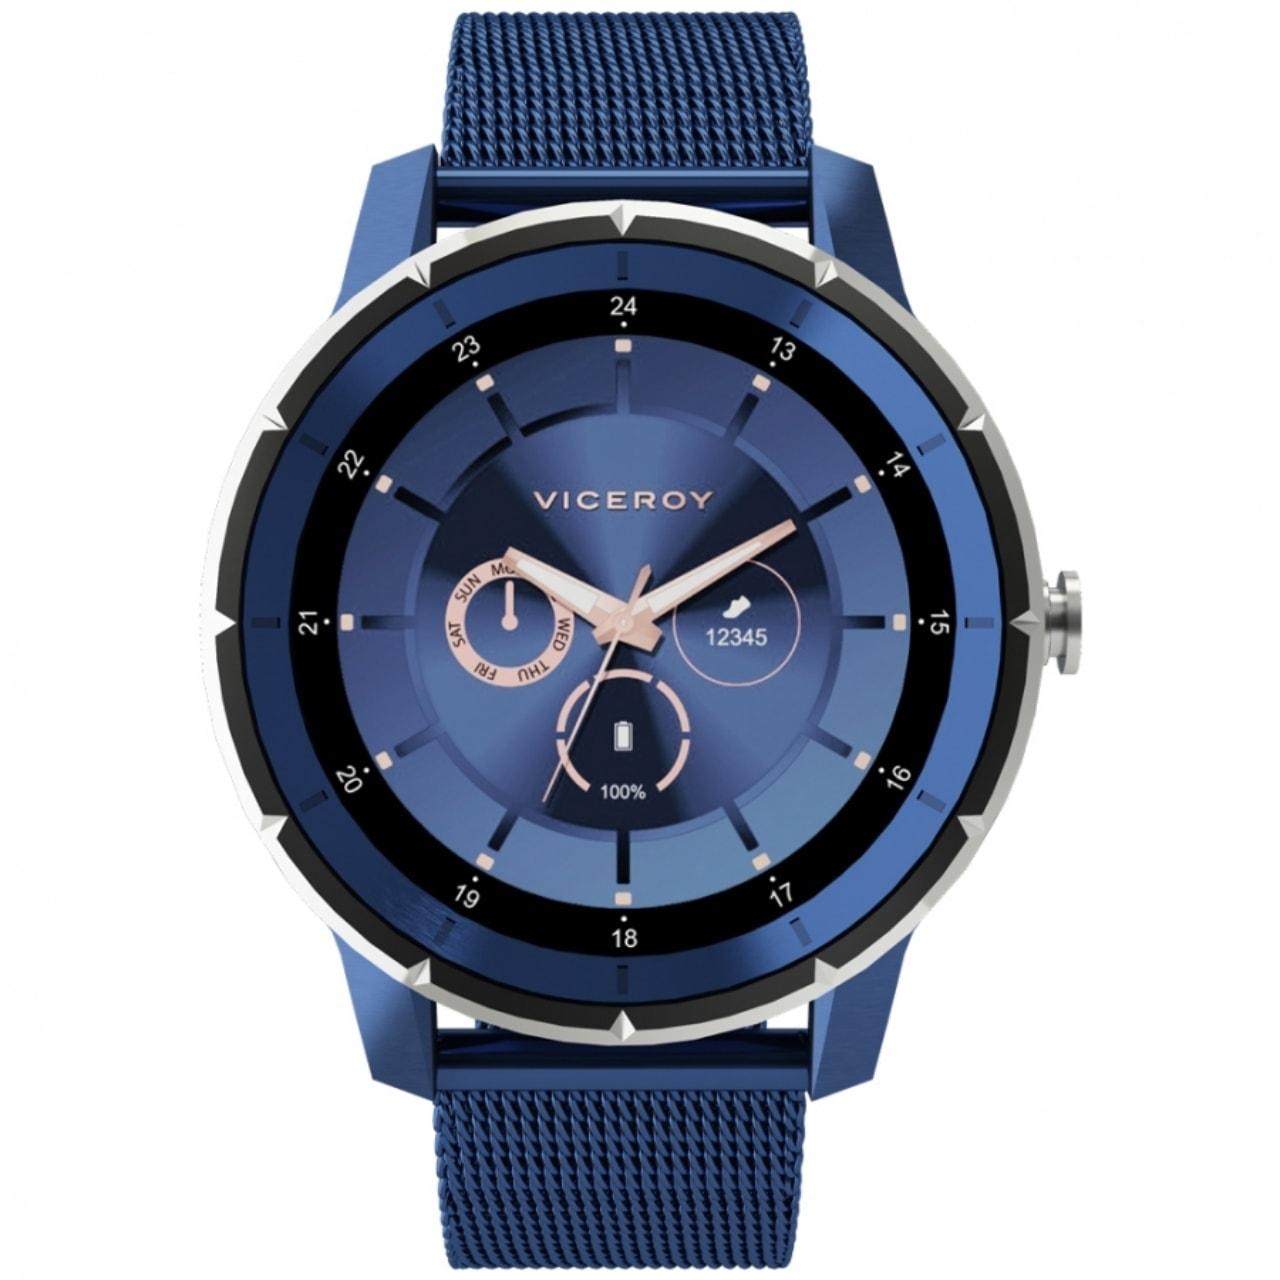 Reloj Viceroy Azul Hombre Smart Pro Océano